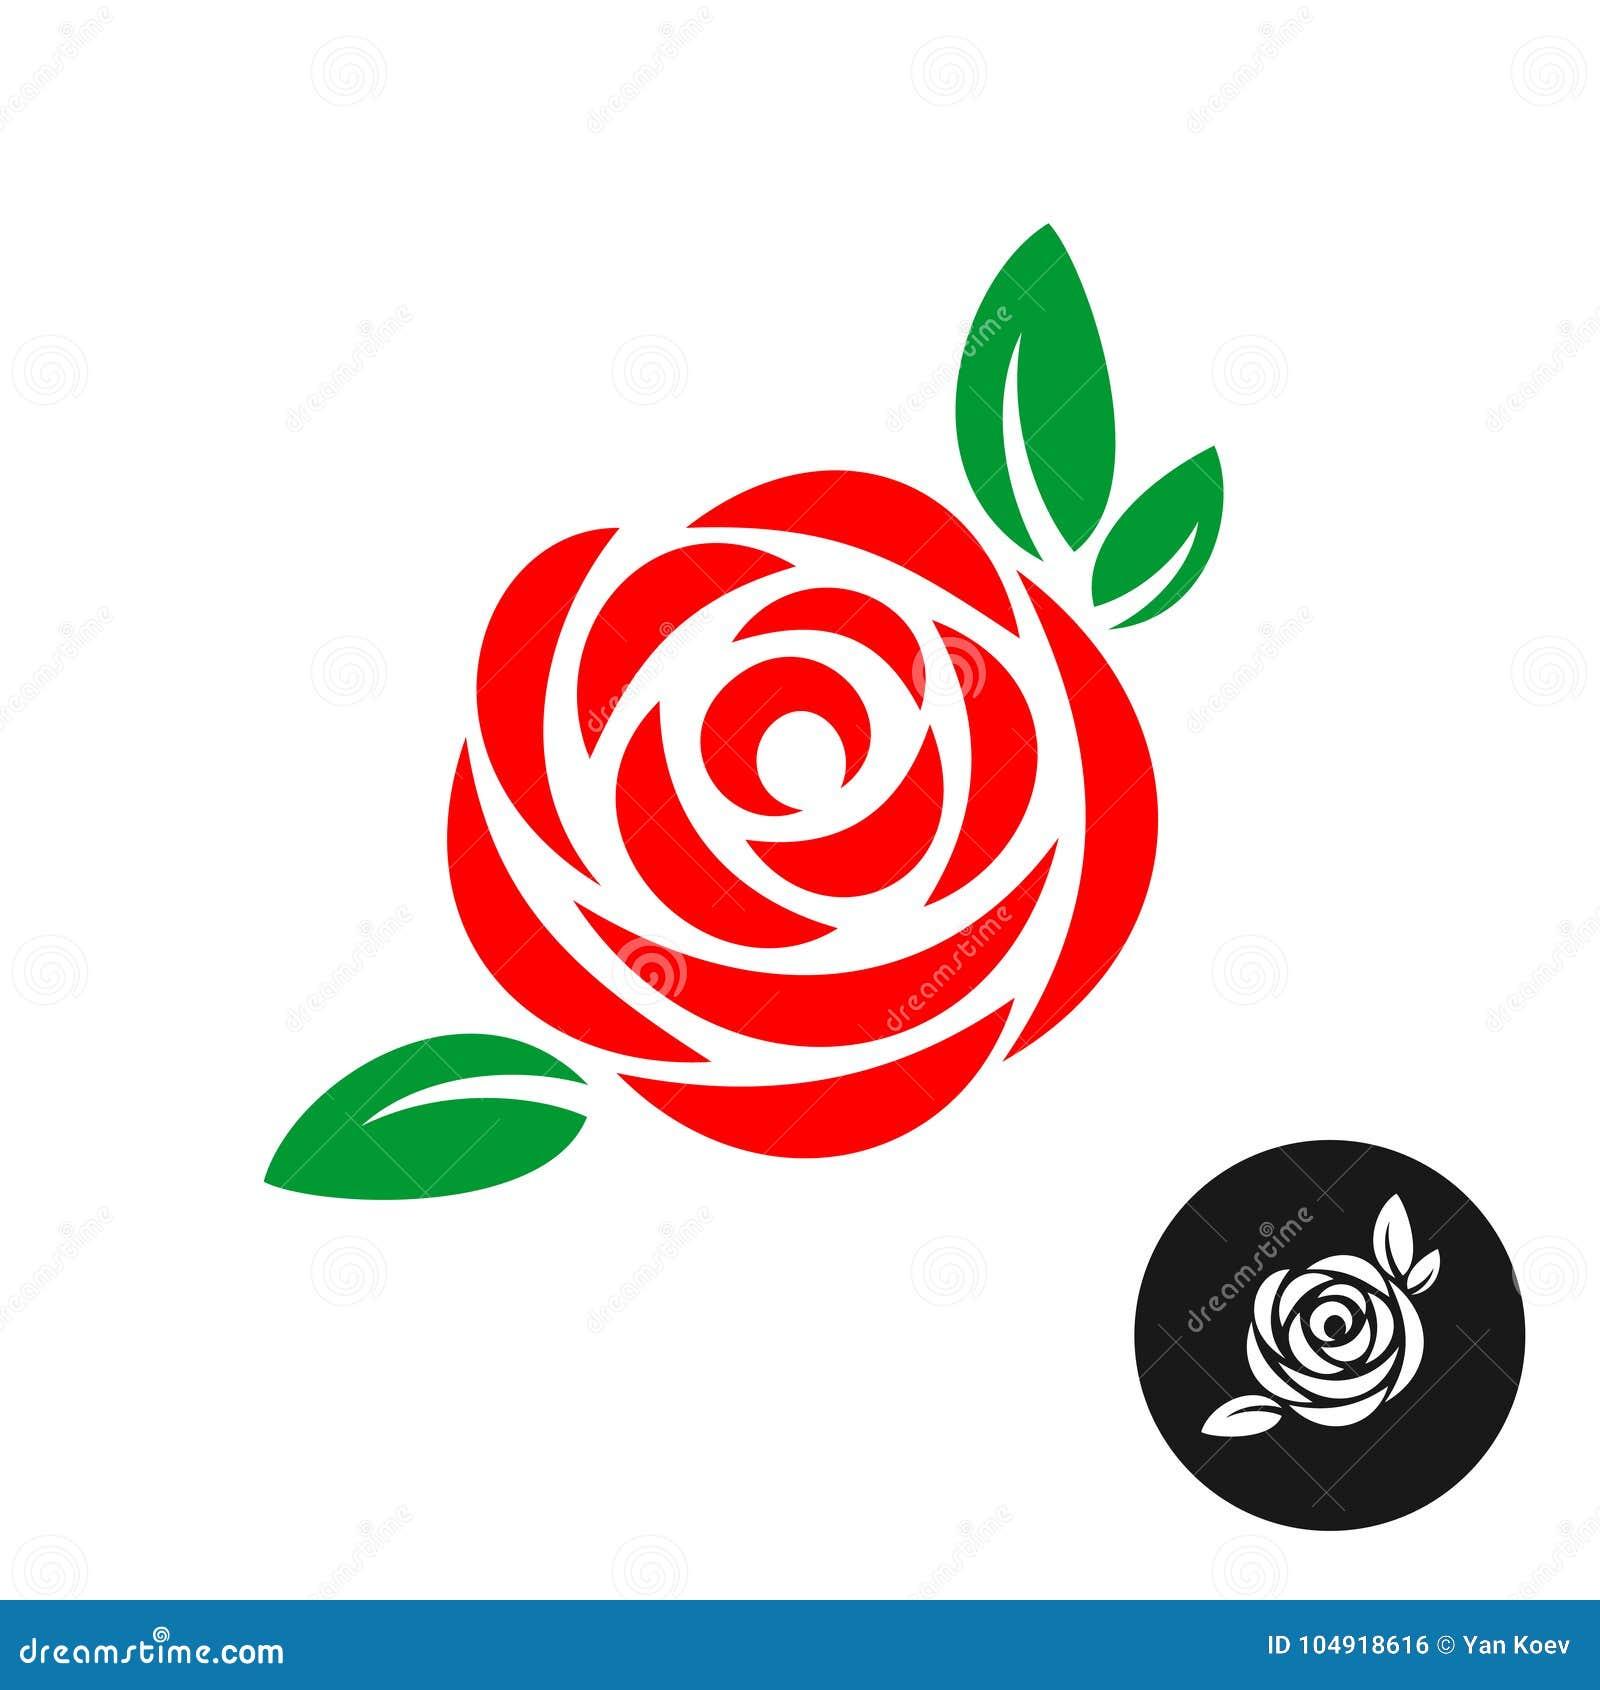 Rose Red Flower With Green Leaves Logo Stock Vector - Illustration ...